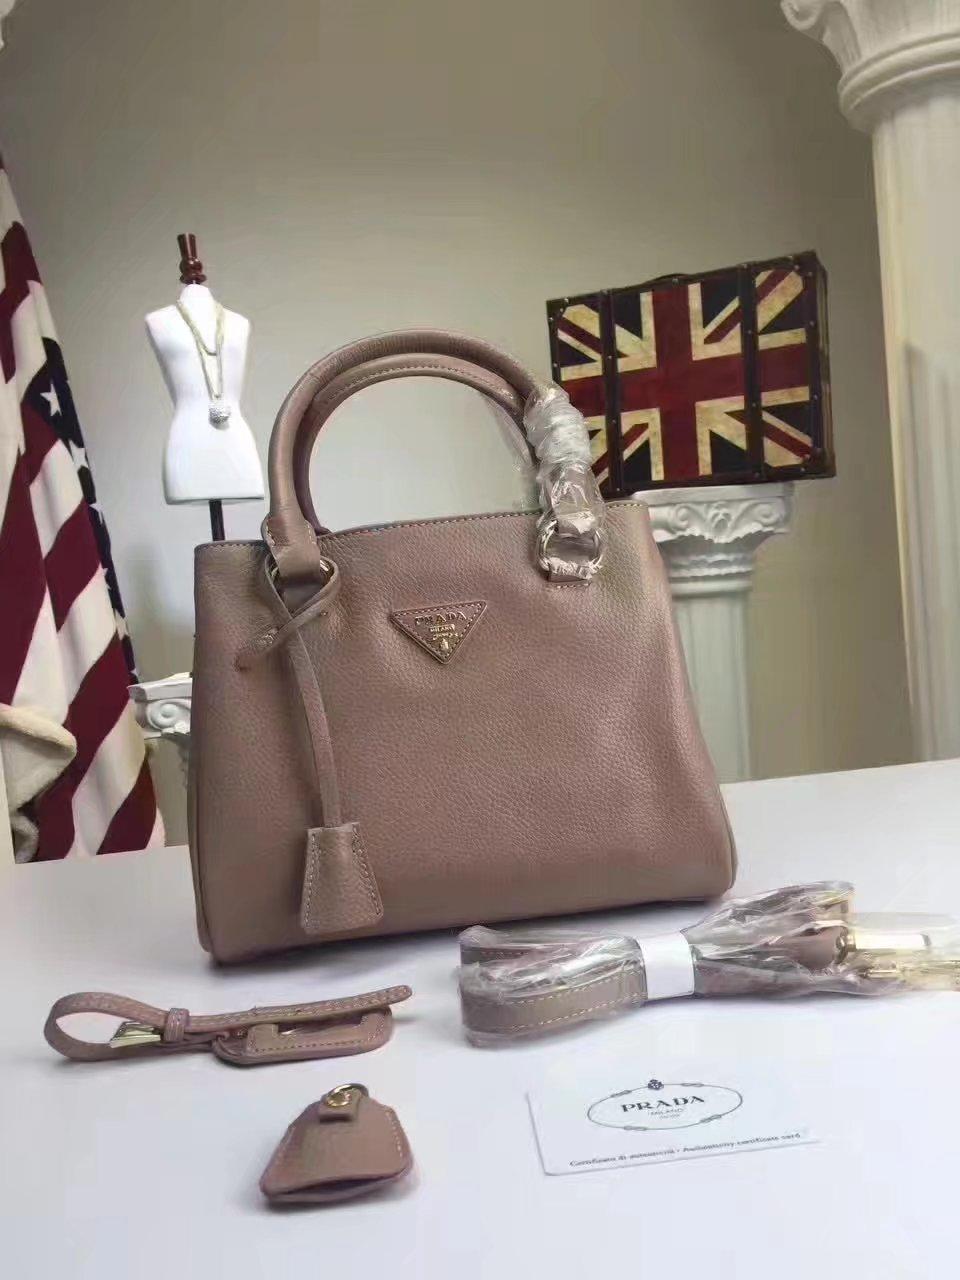 Prada Calf Leather Tote Double Leather Top Handle Bag Khaki